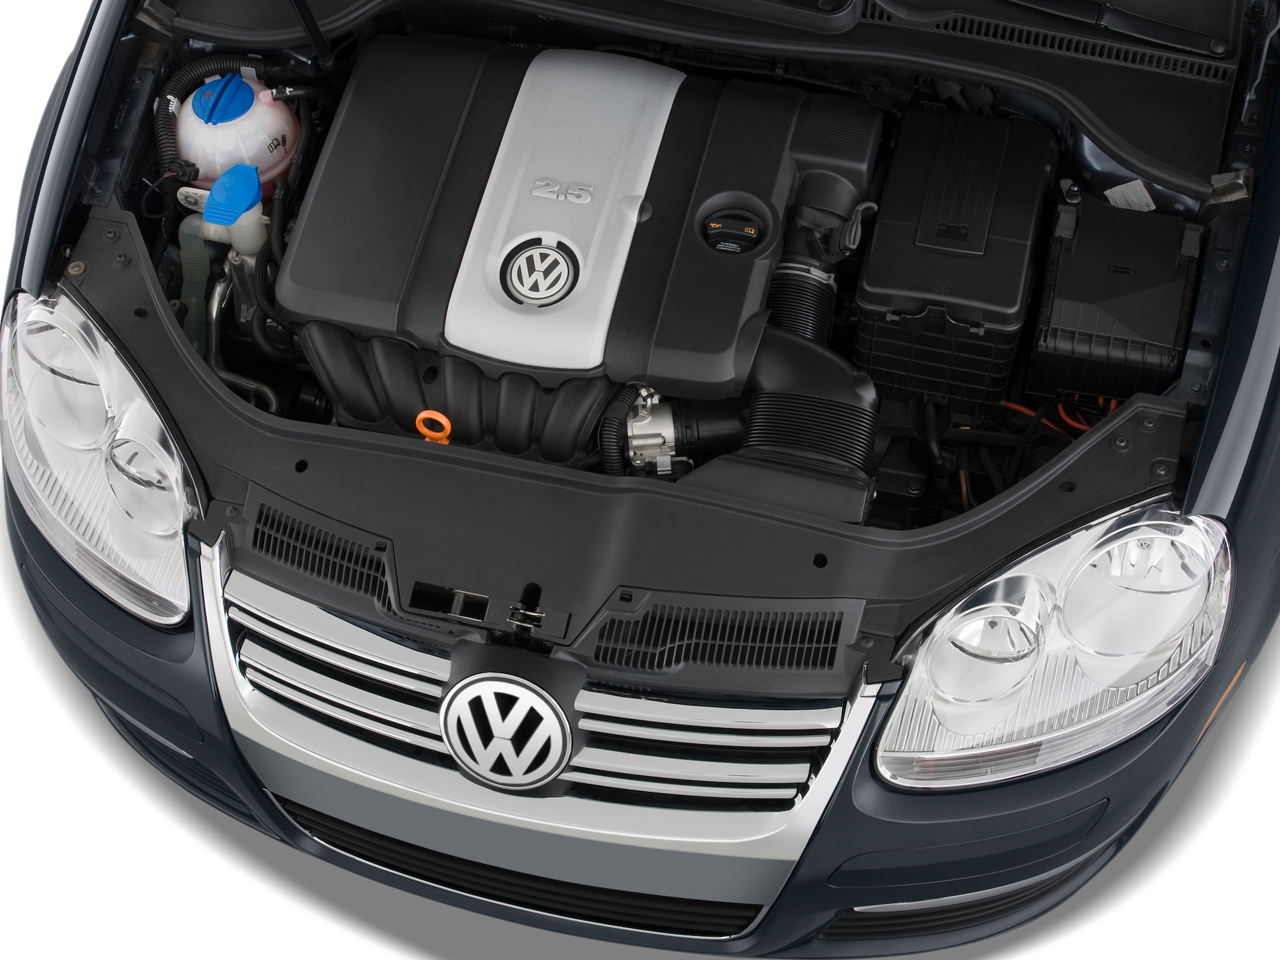 Awesome 2009 Volkswagen Jetta Engine Diagram Wiring Diagram Wiring Cloud Monangrecoveryedborg